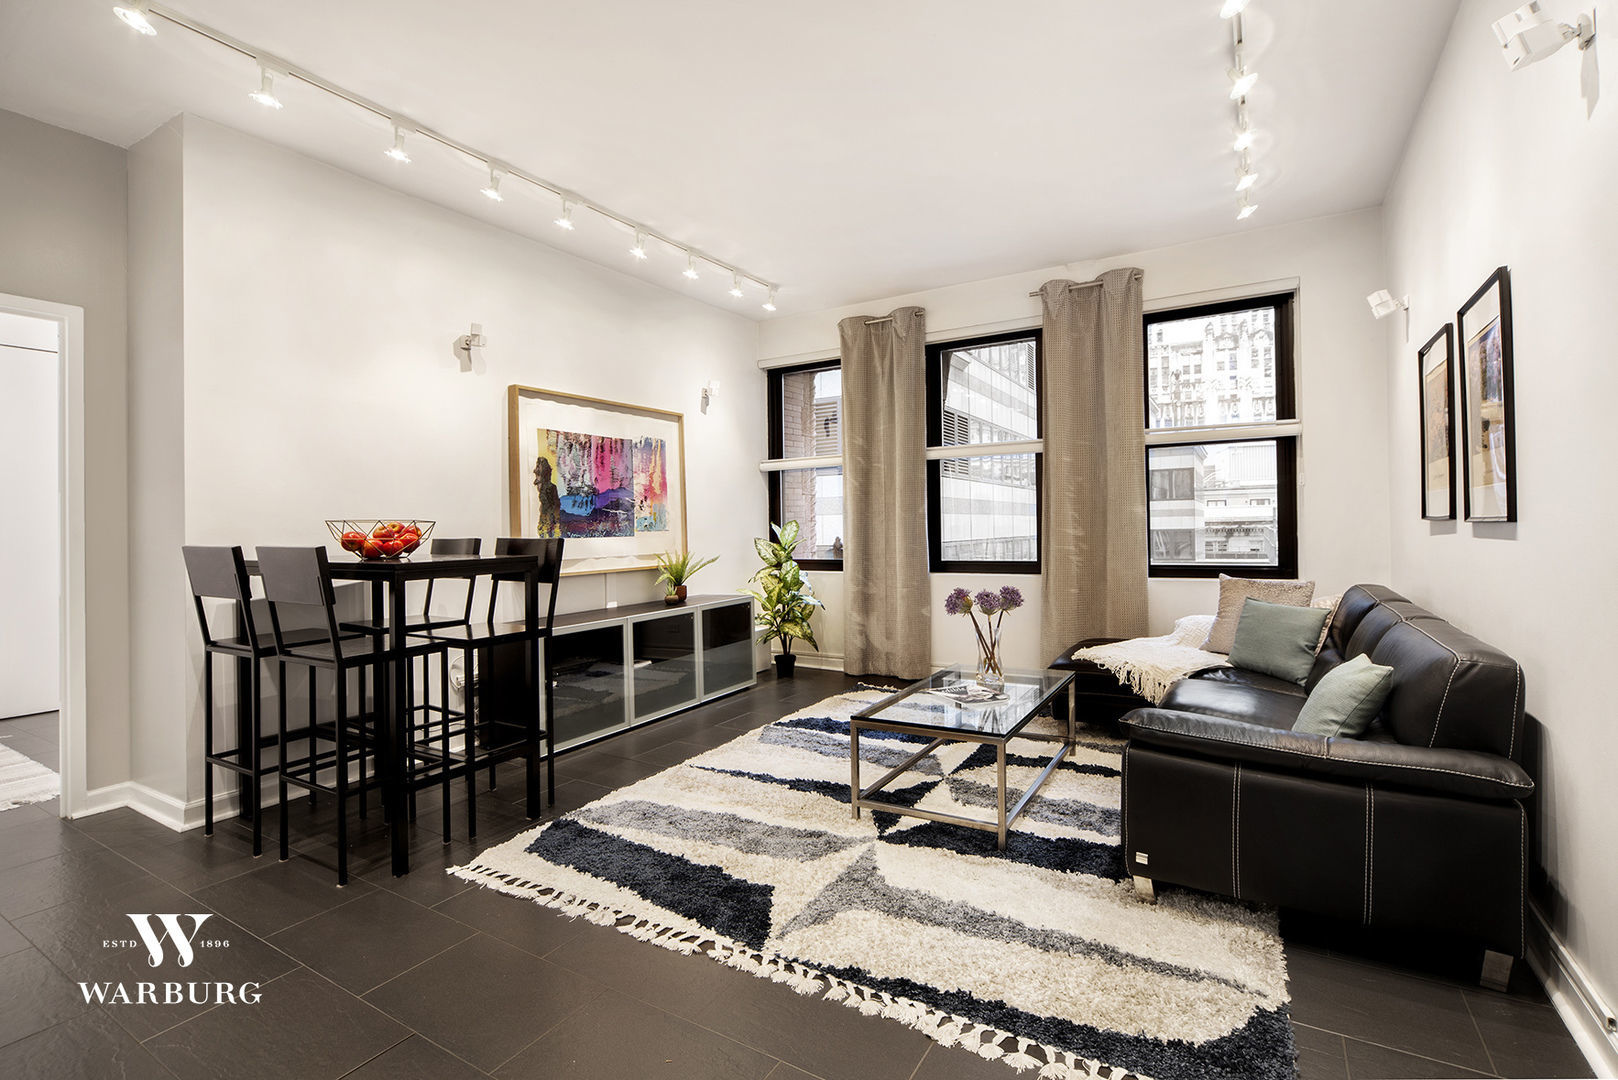 Apartment for sale at 56 Pine Street, Apt 10B